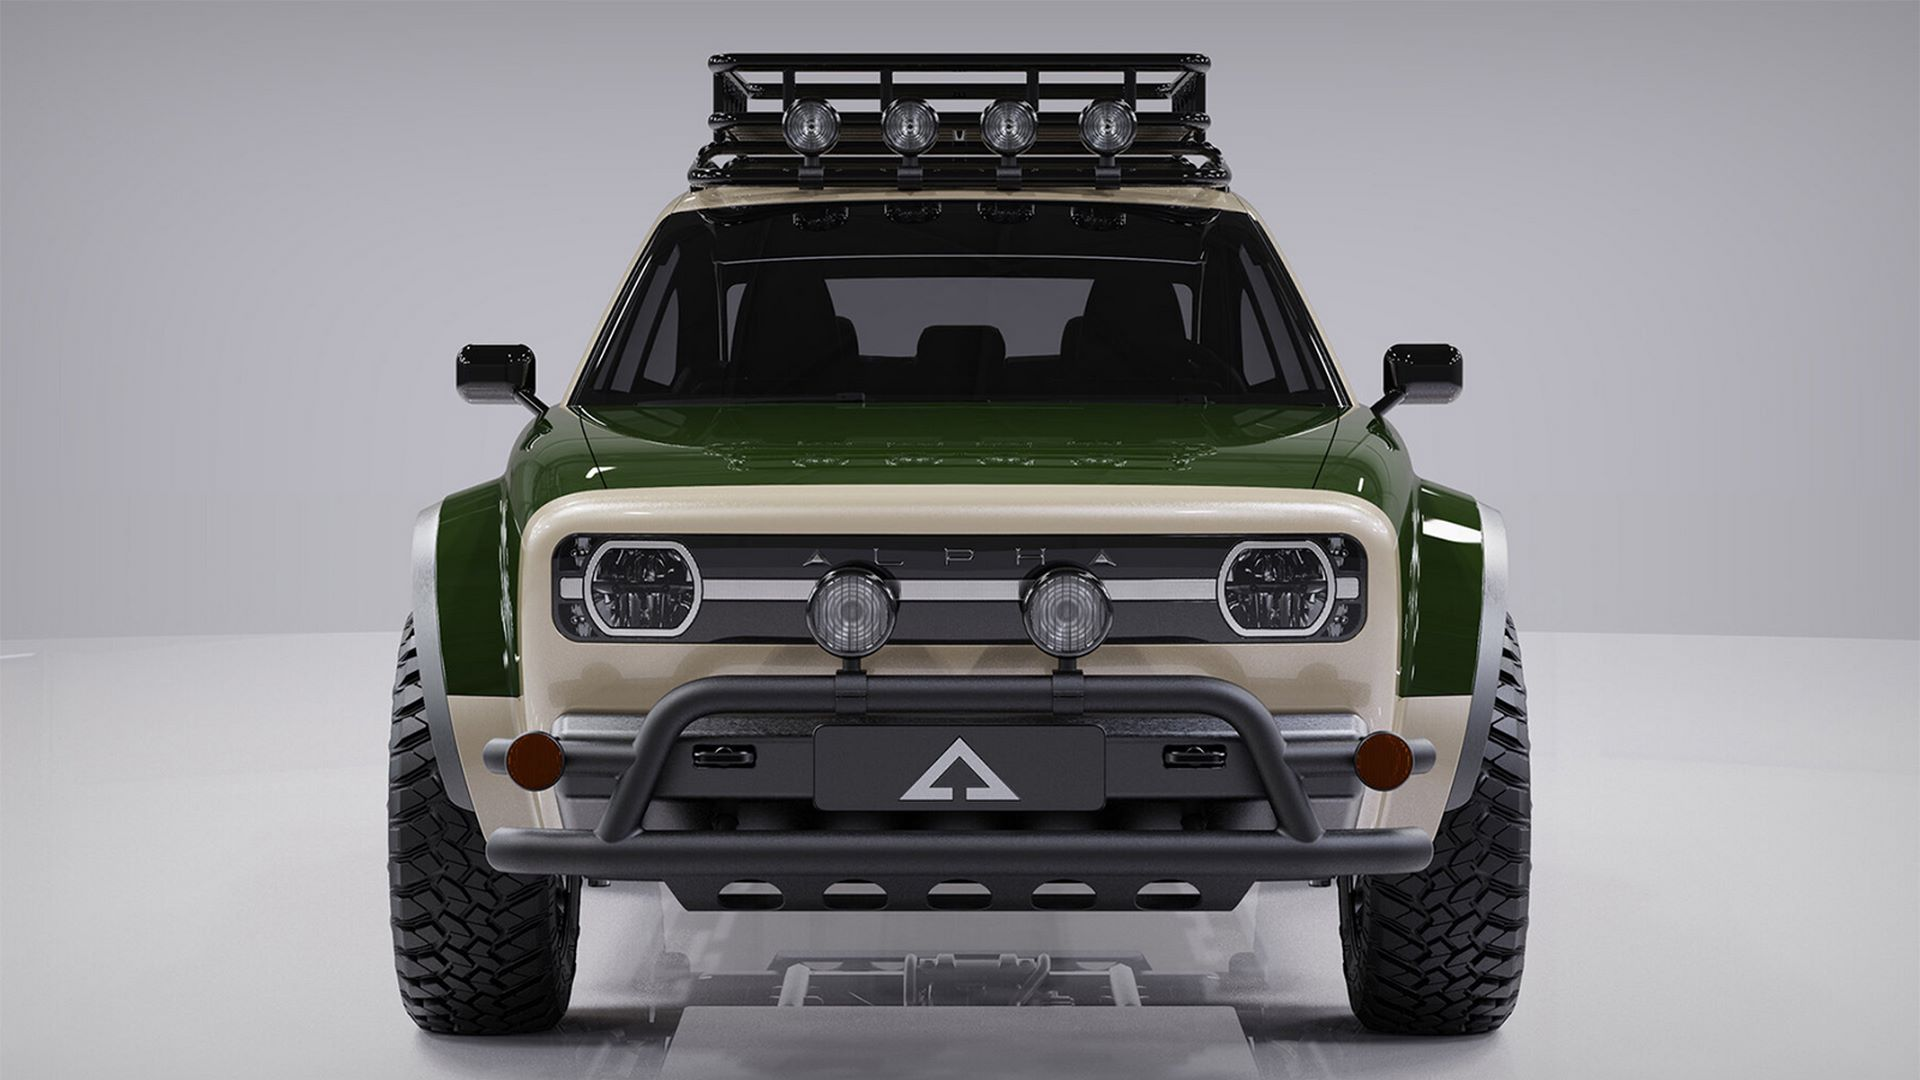 Alpha-Ace-Jax-5